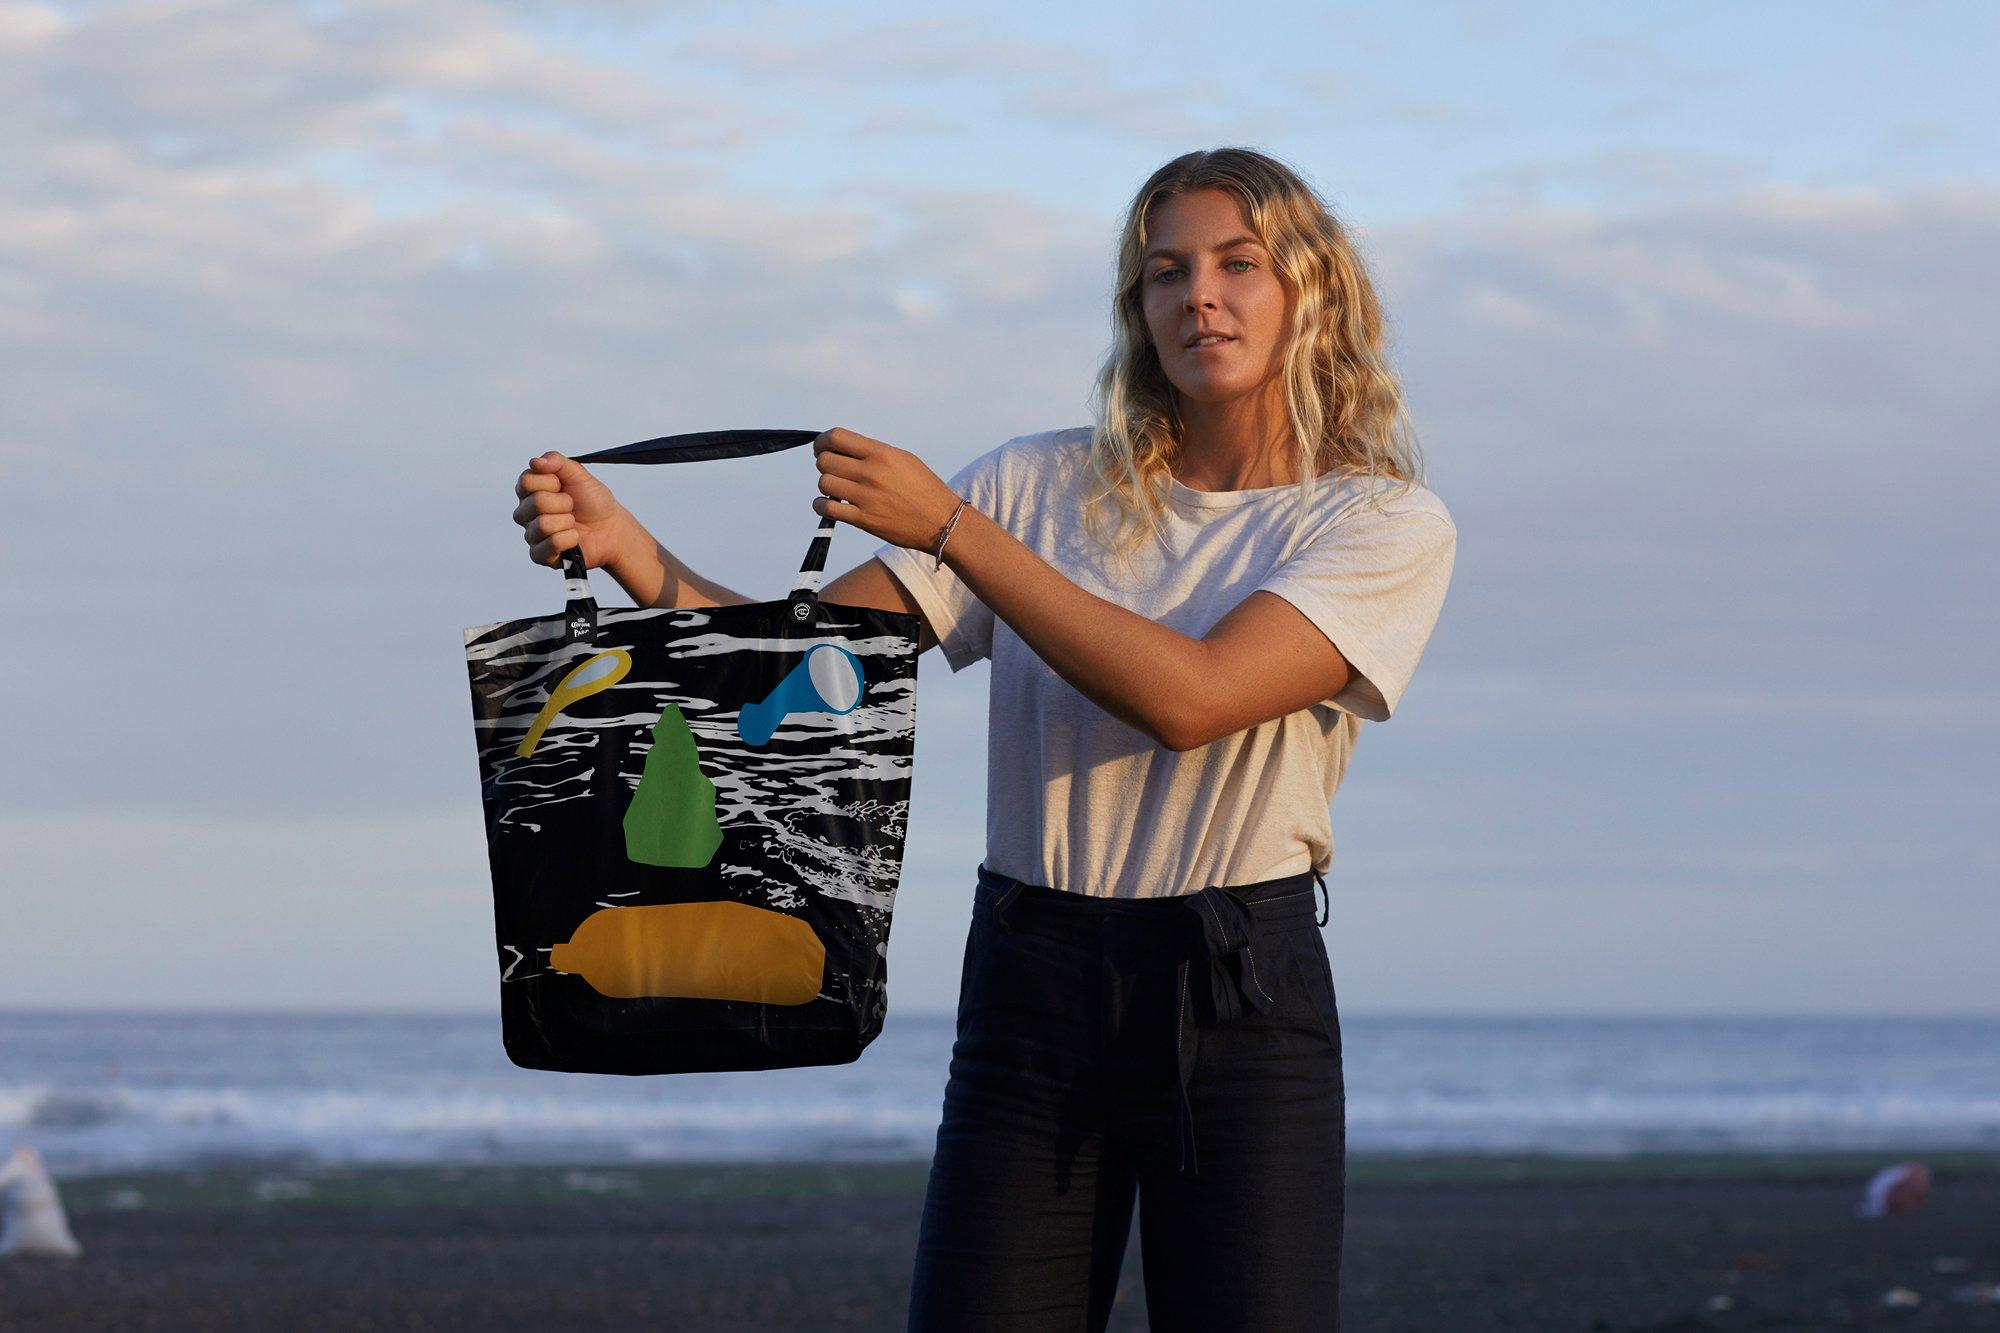 Black Parley Ocean Reusable Bag